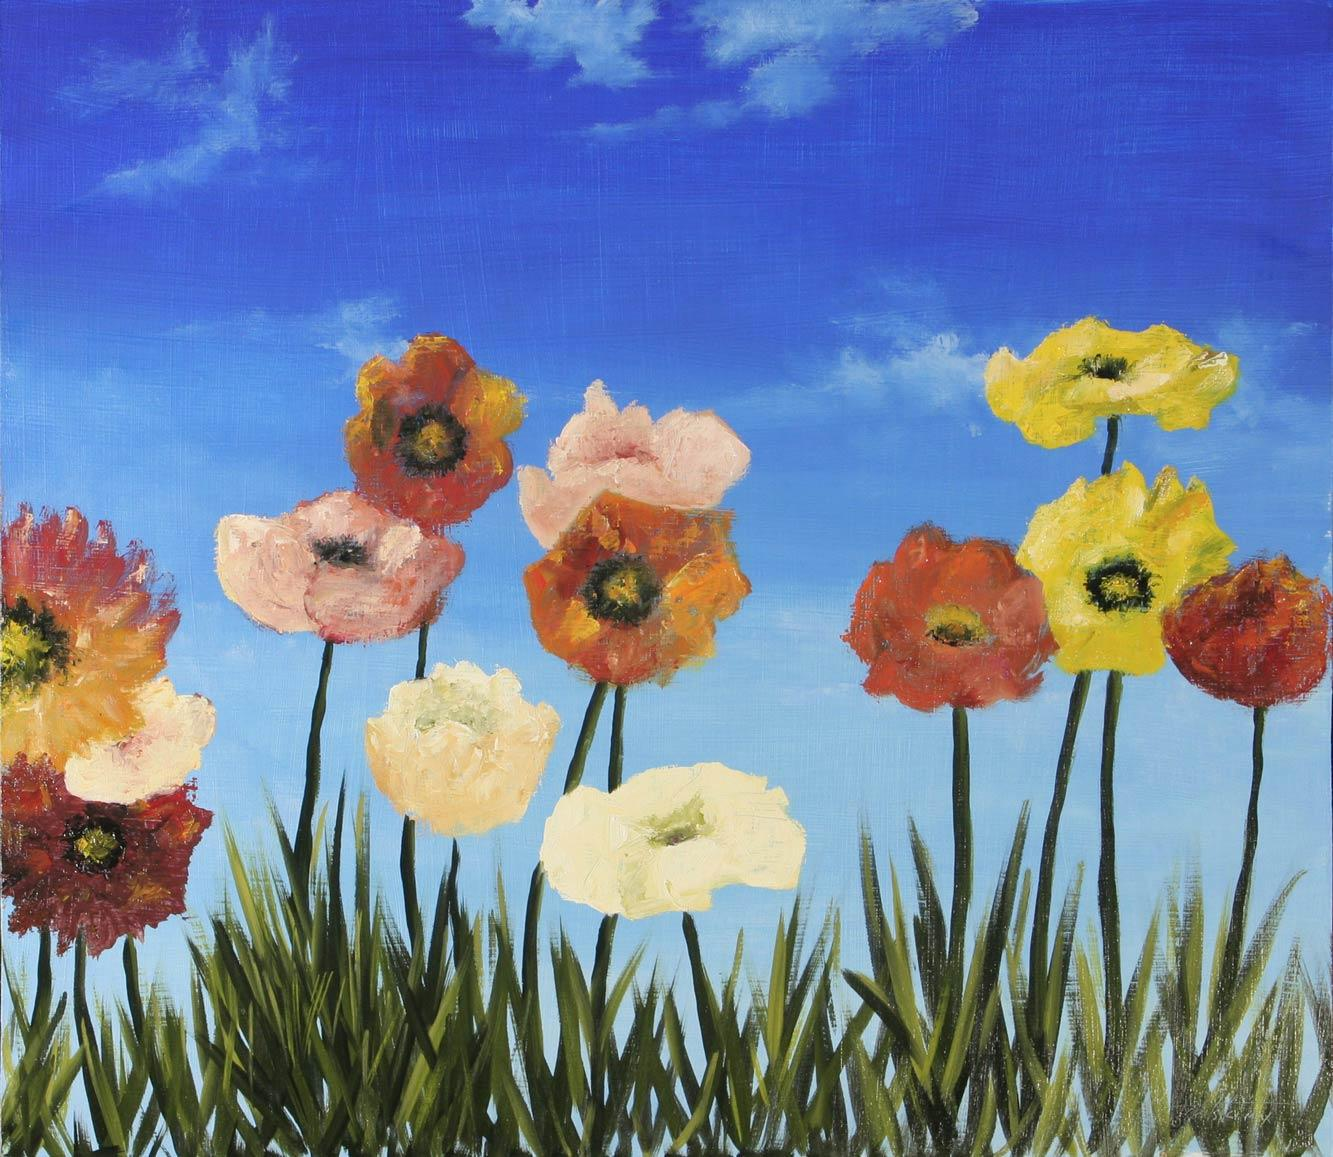 Flowers oil painting fine arts gallery original fine art oil flowers oil painting on hdf by artist darko topalski izmirmasajfo